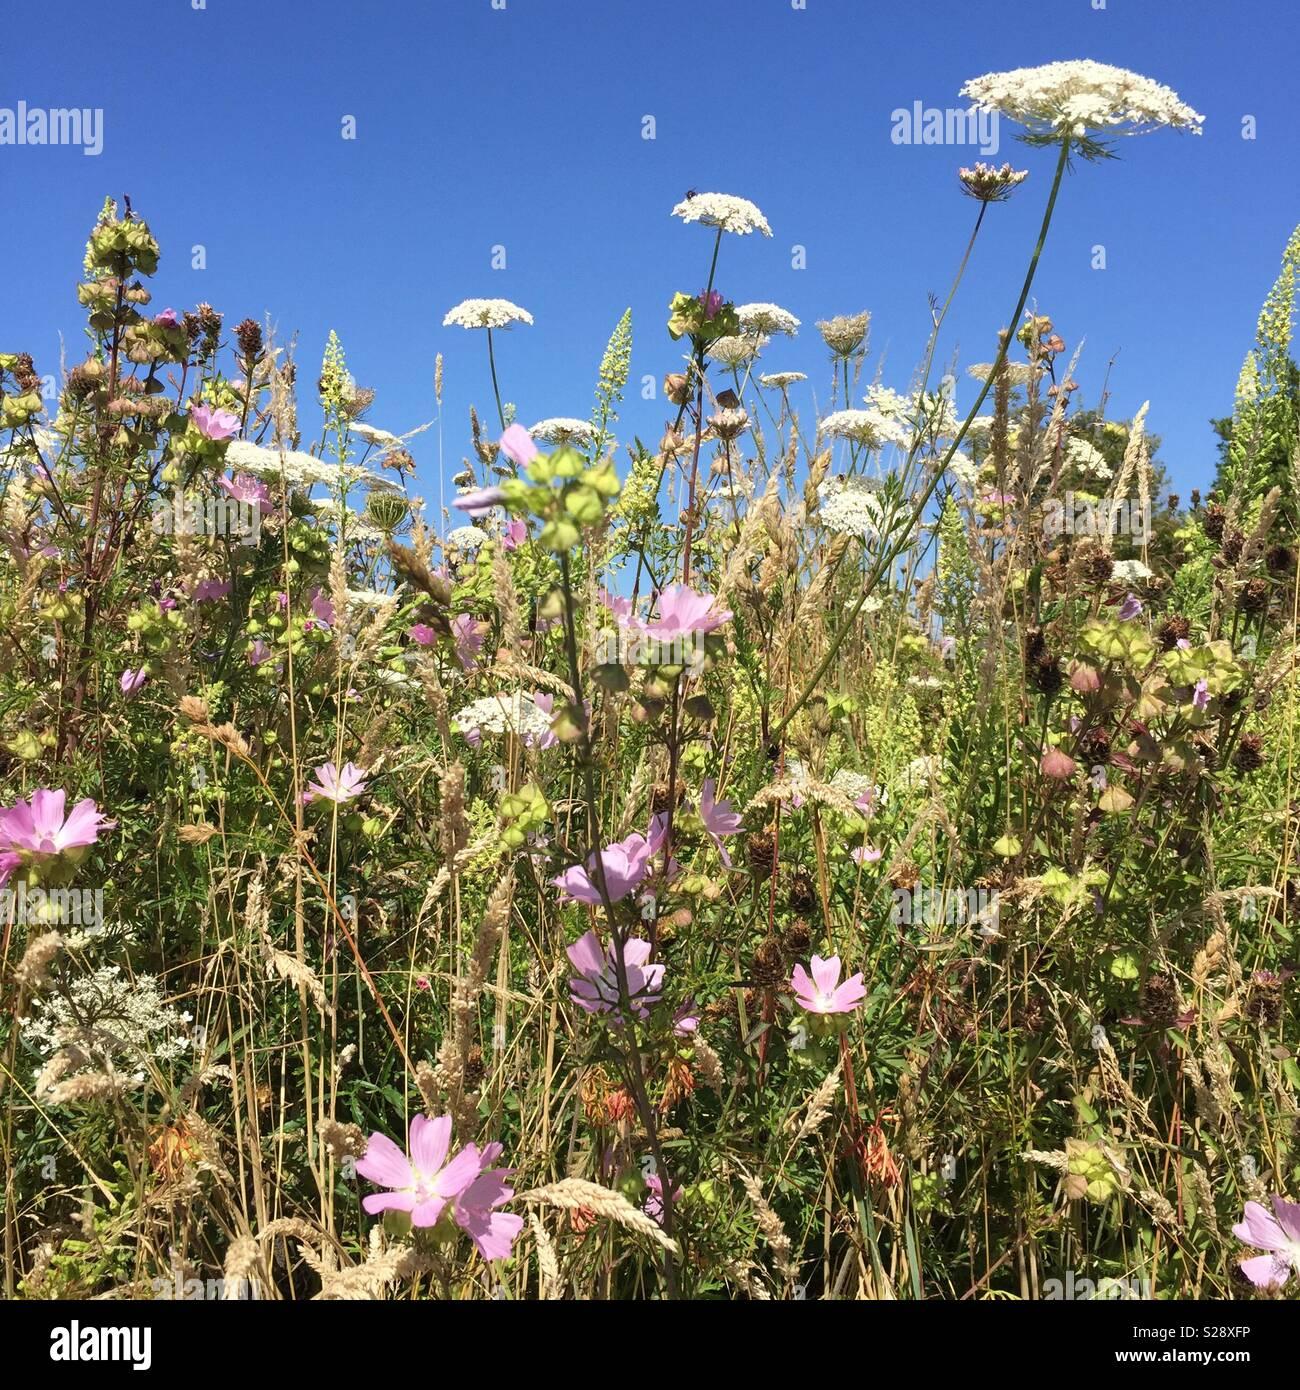 Wildflowers in Primrose nature reserve, Jarrow, Tyne and Wear. UK - Stock Image